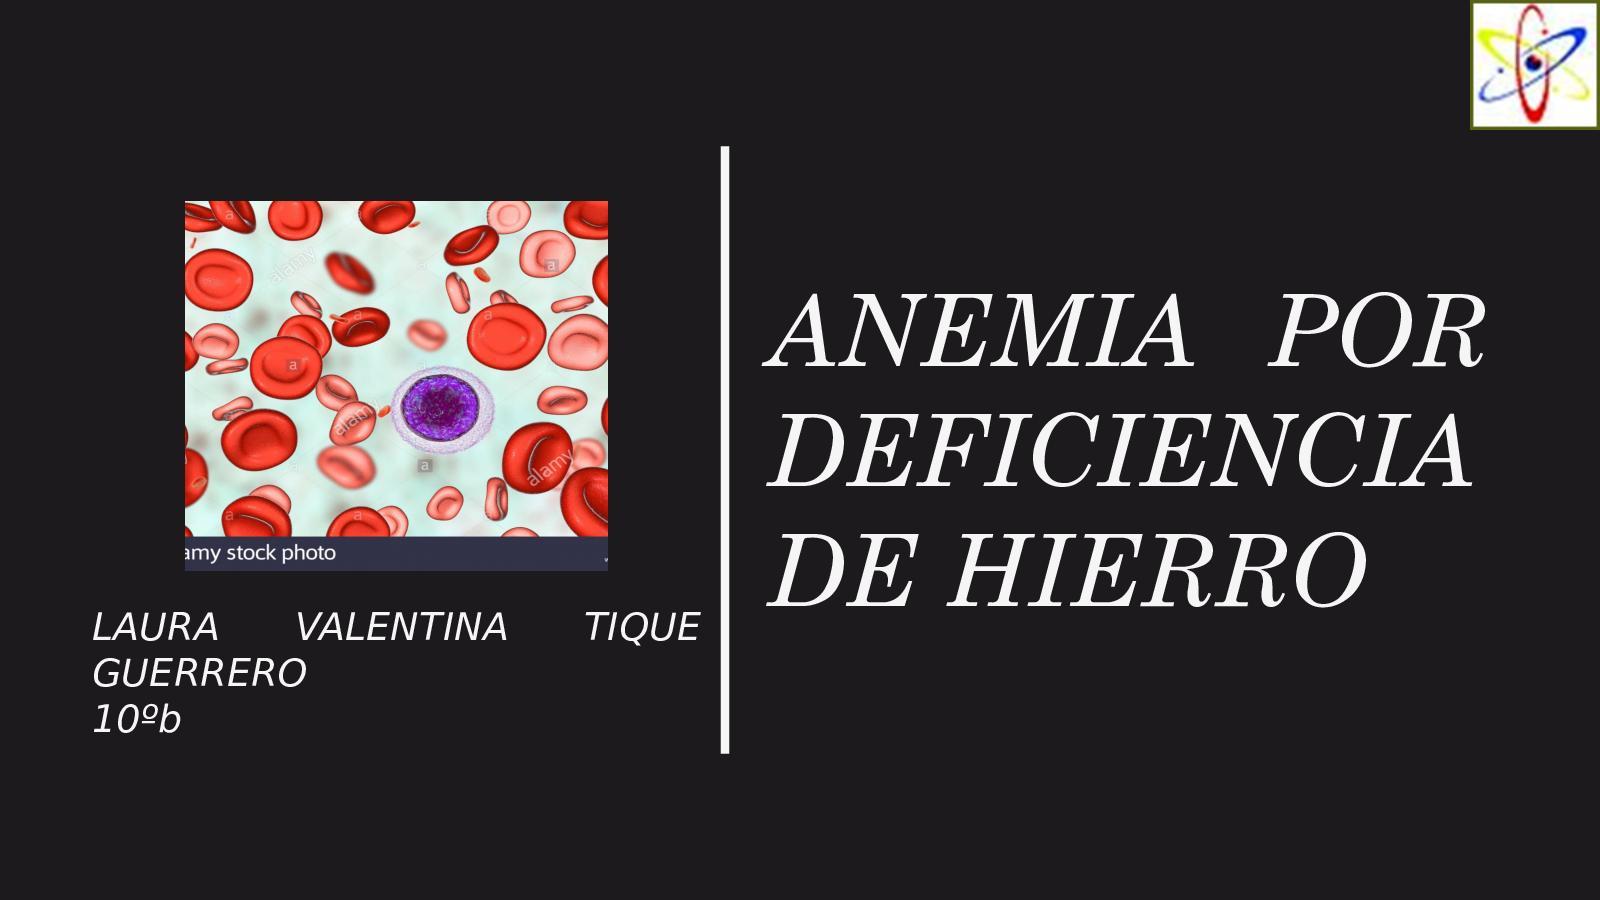 anemia x falta de hierro